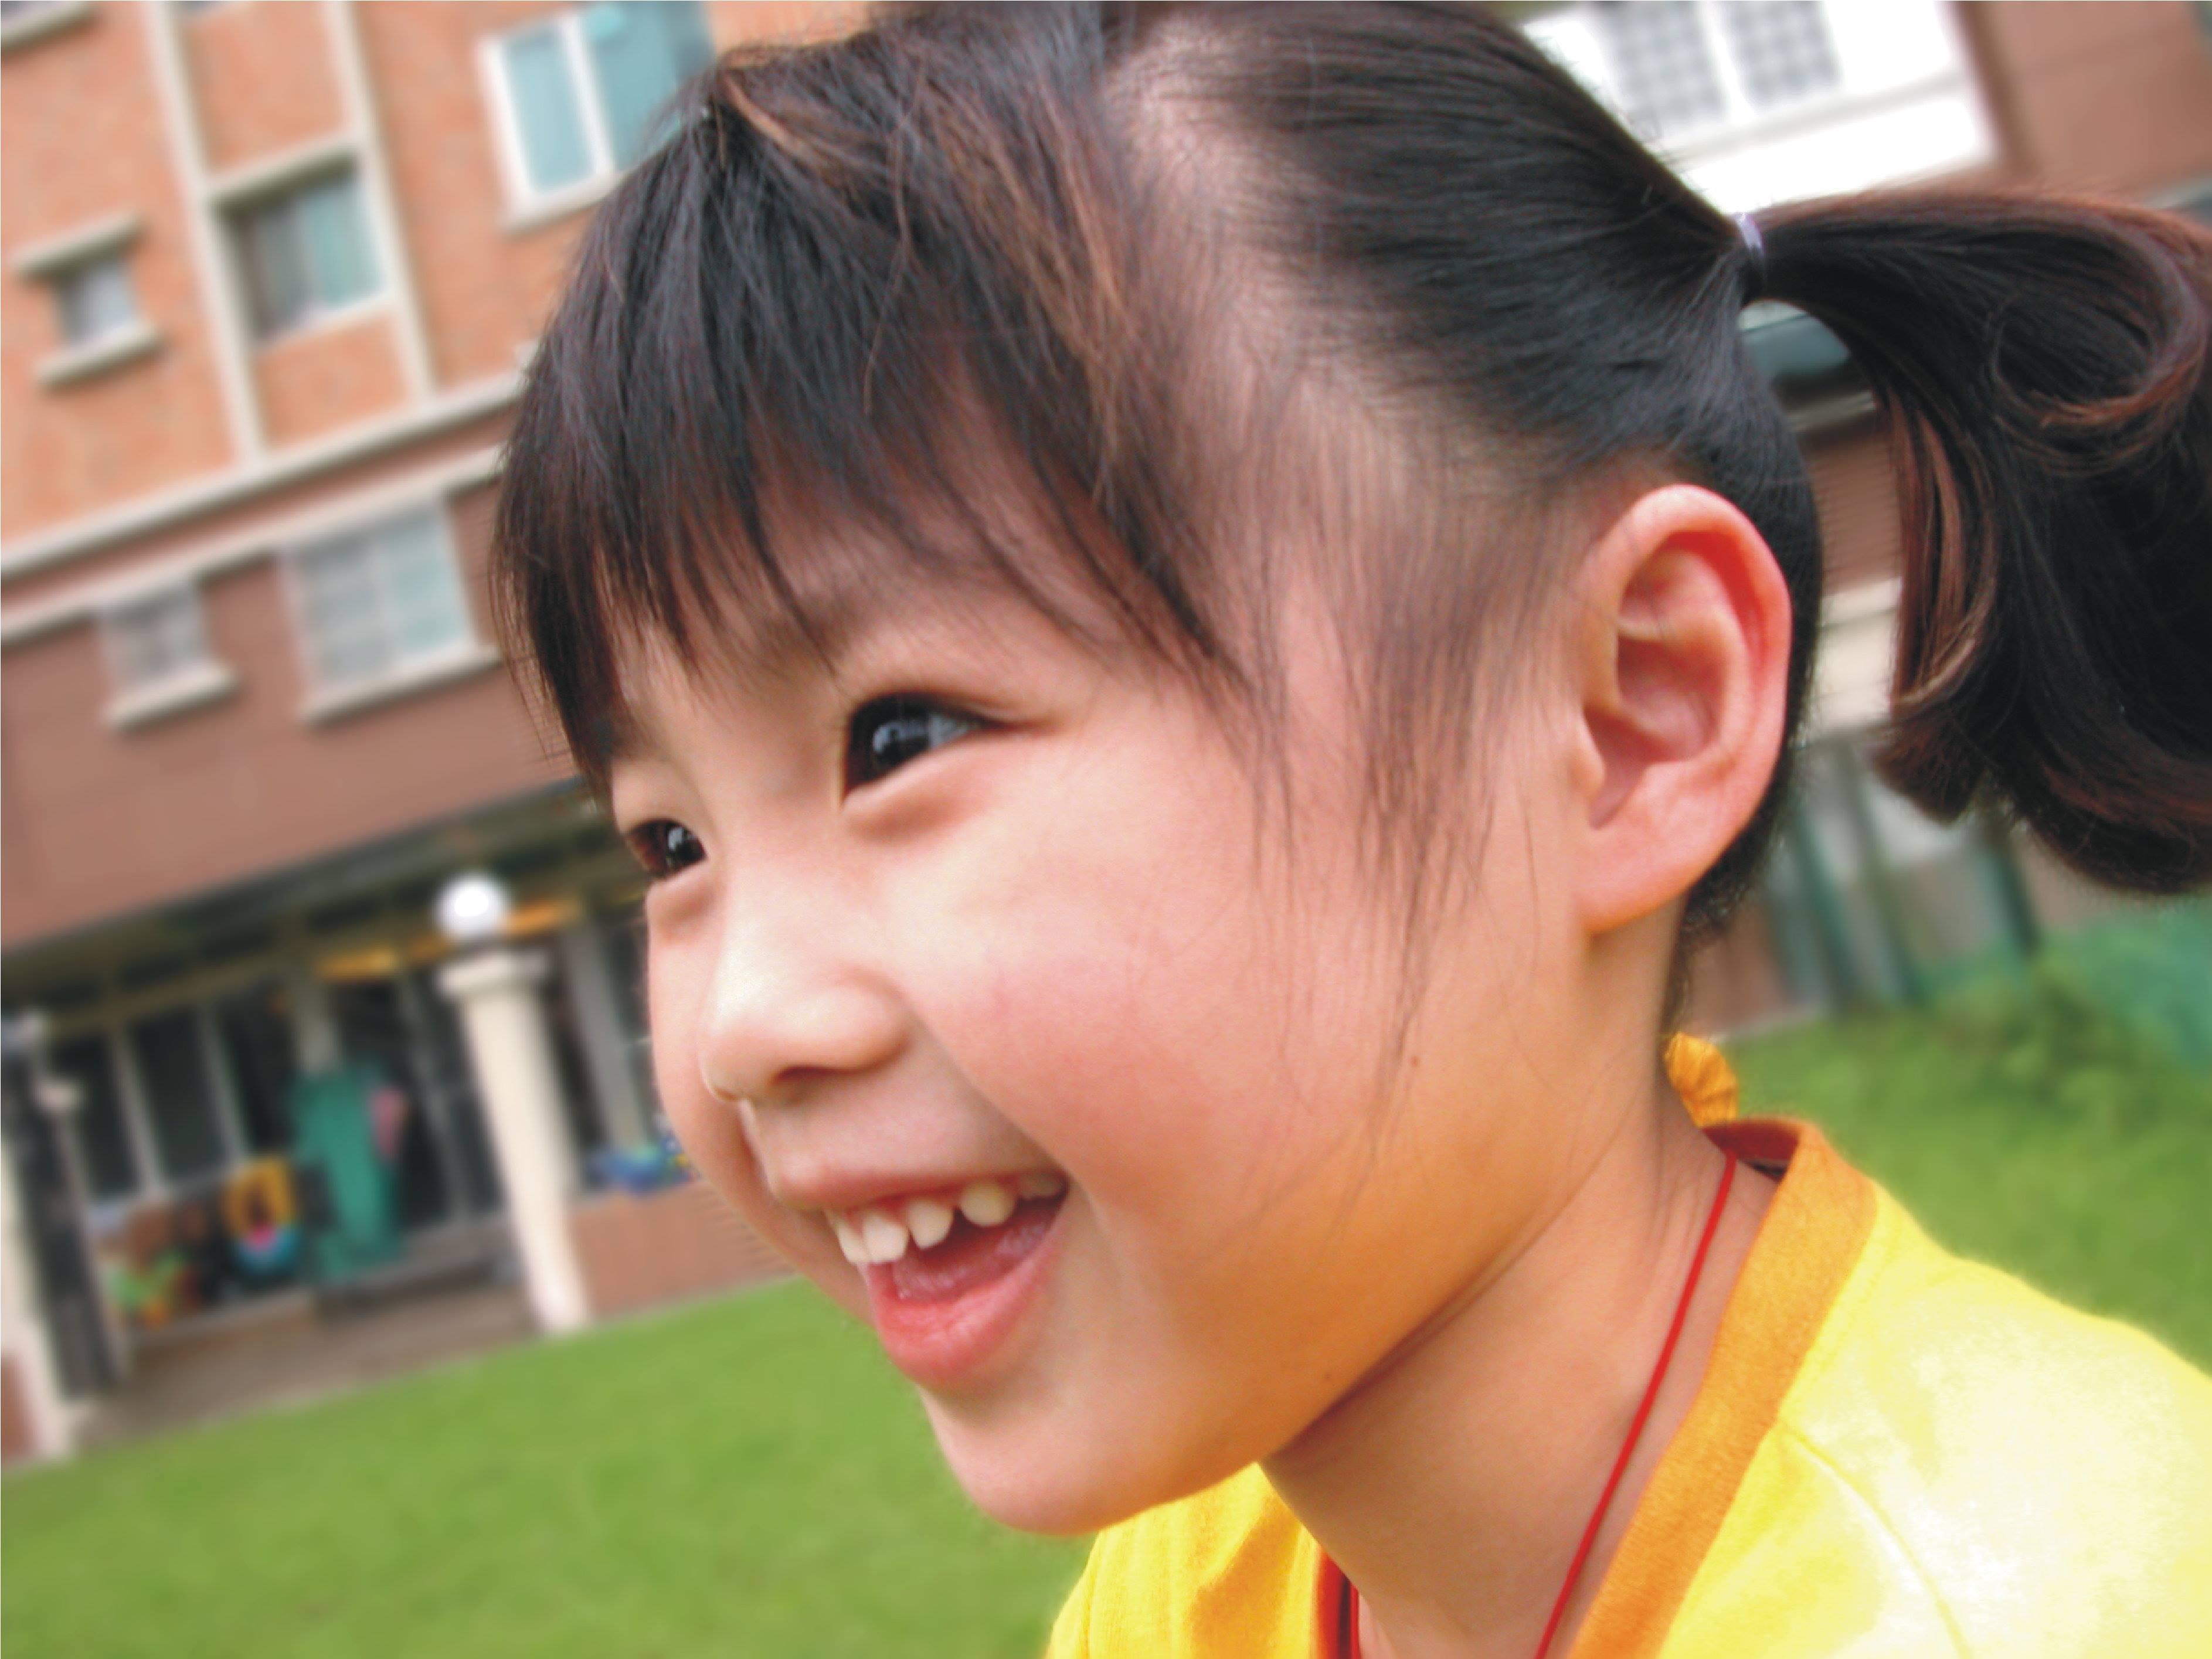 幼兒園 Kindergarten – 巨星美語學校 Super Star American School